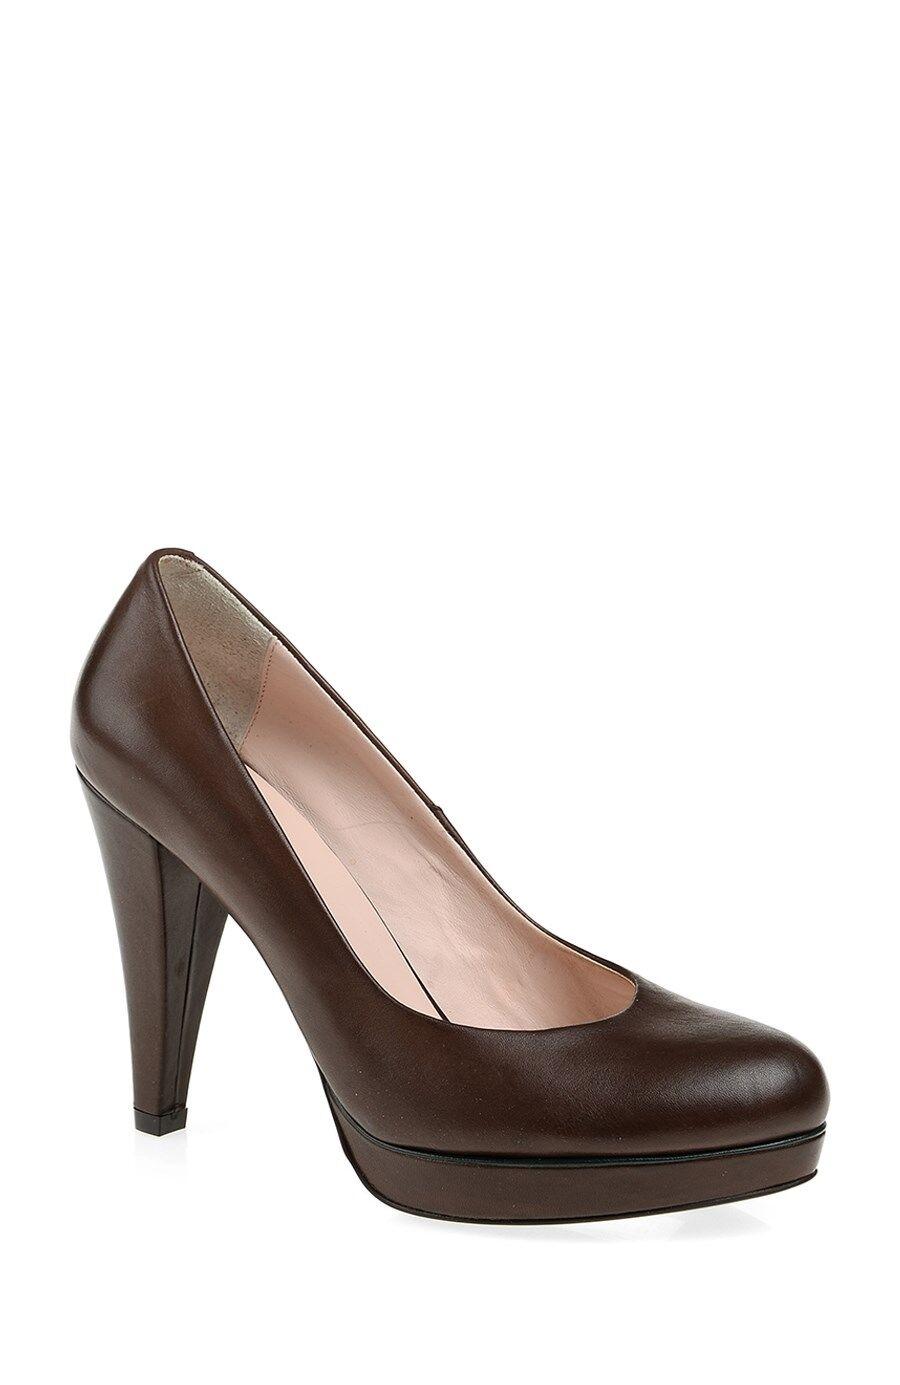 George Hogg Kahverengi Topuklu Ayakkabı